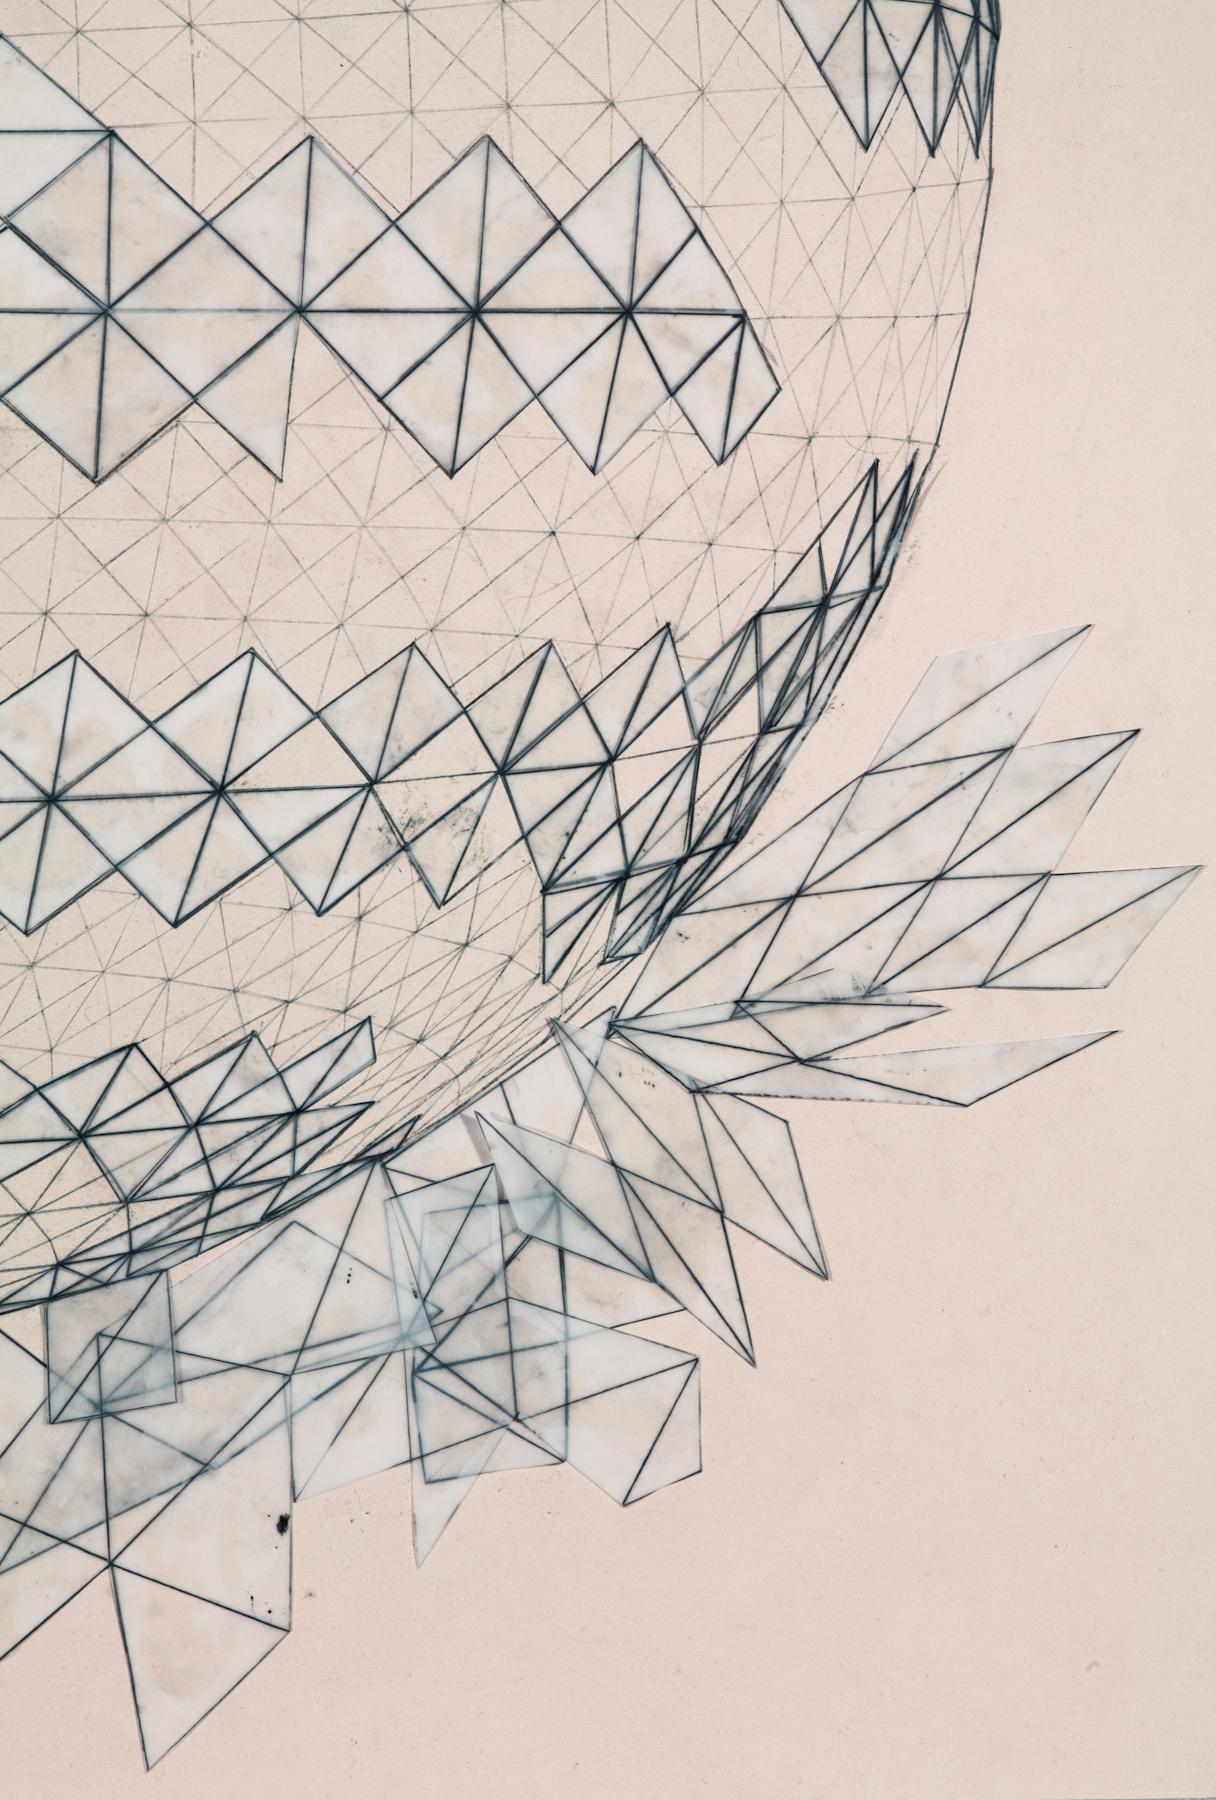 Broken Geodesic #2 (detail)